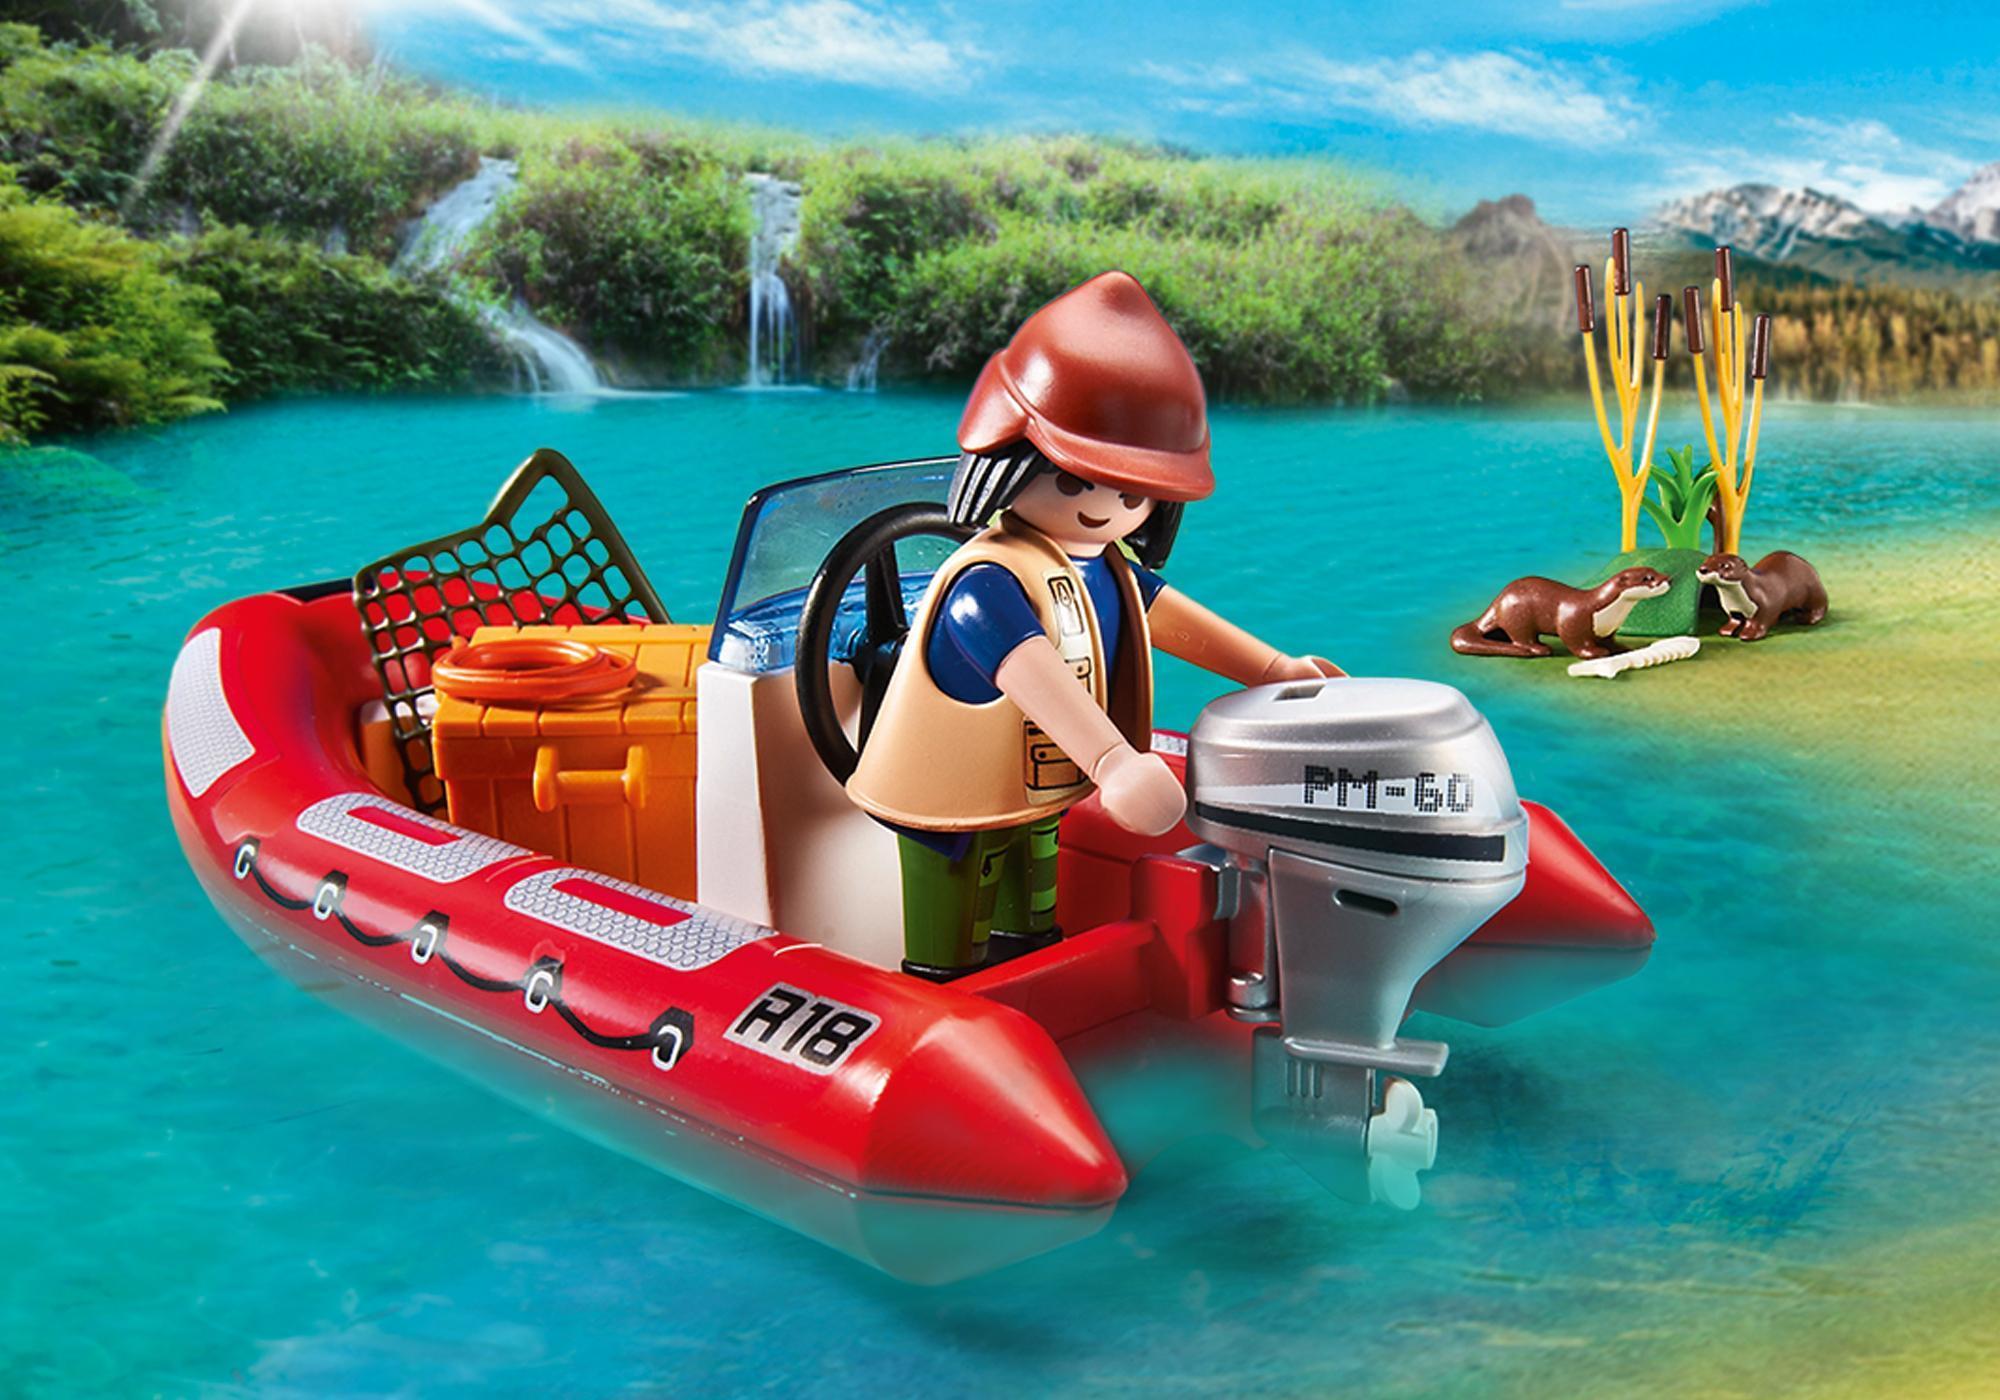 http://media.playmobil.com/i/playmobil/5559_product_extra2/Schlauchboot mit Wilderern